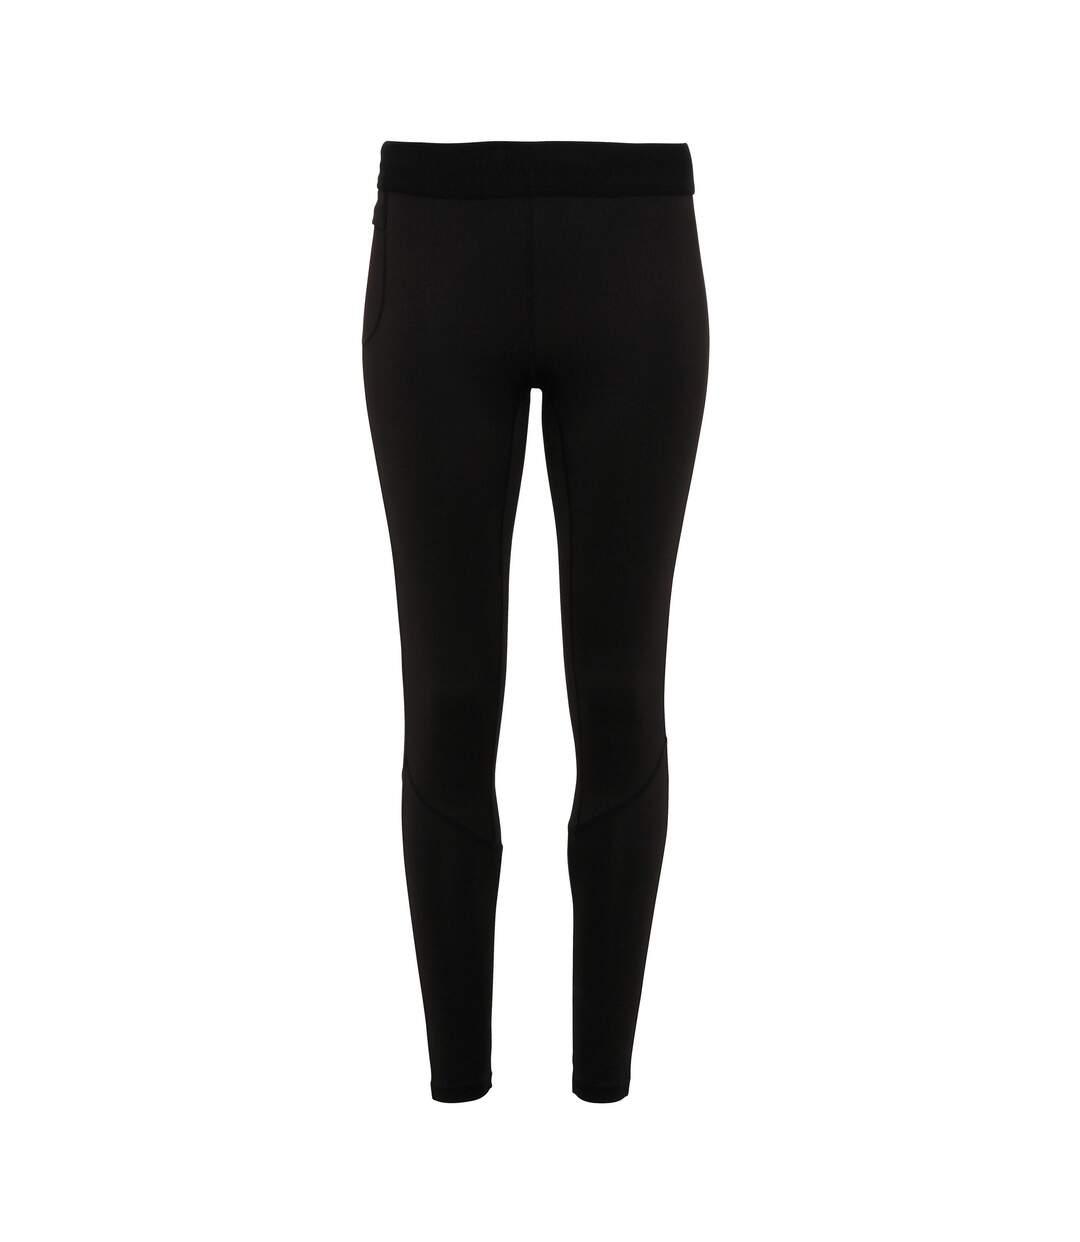 TriDri Mens Training Leggings (Black) - UTRW6121